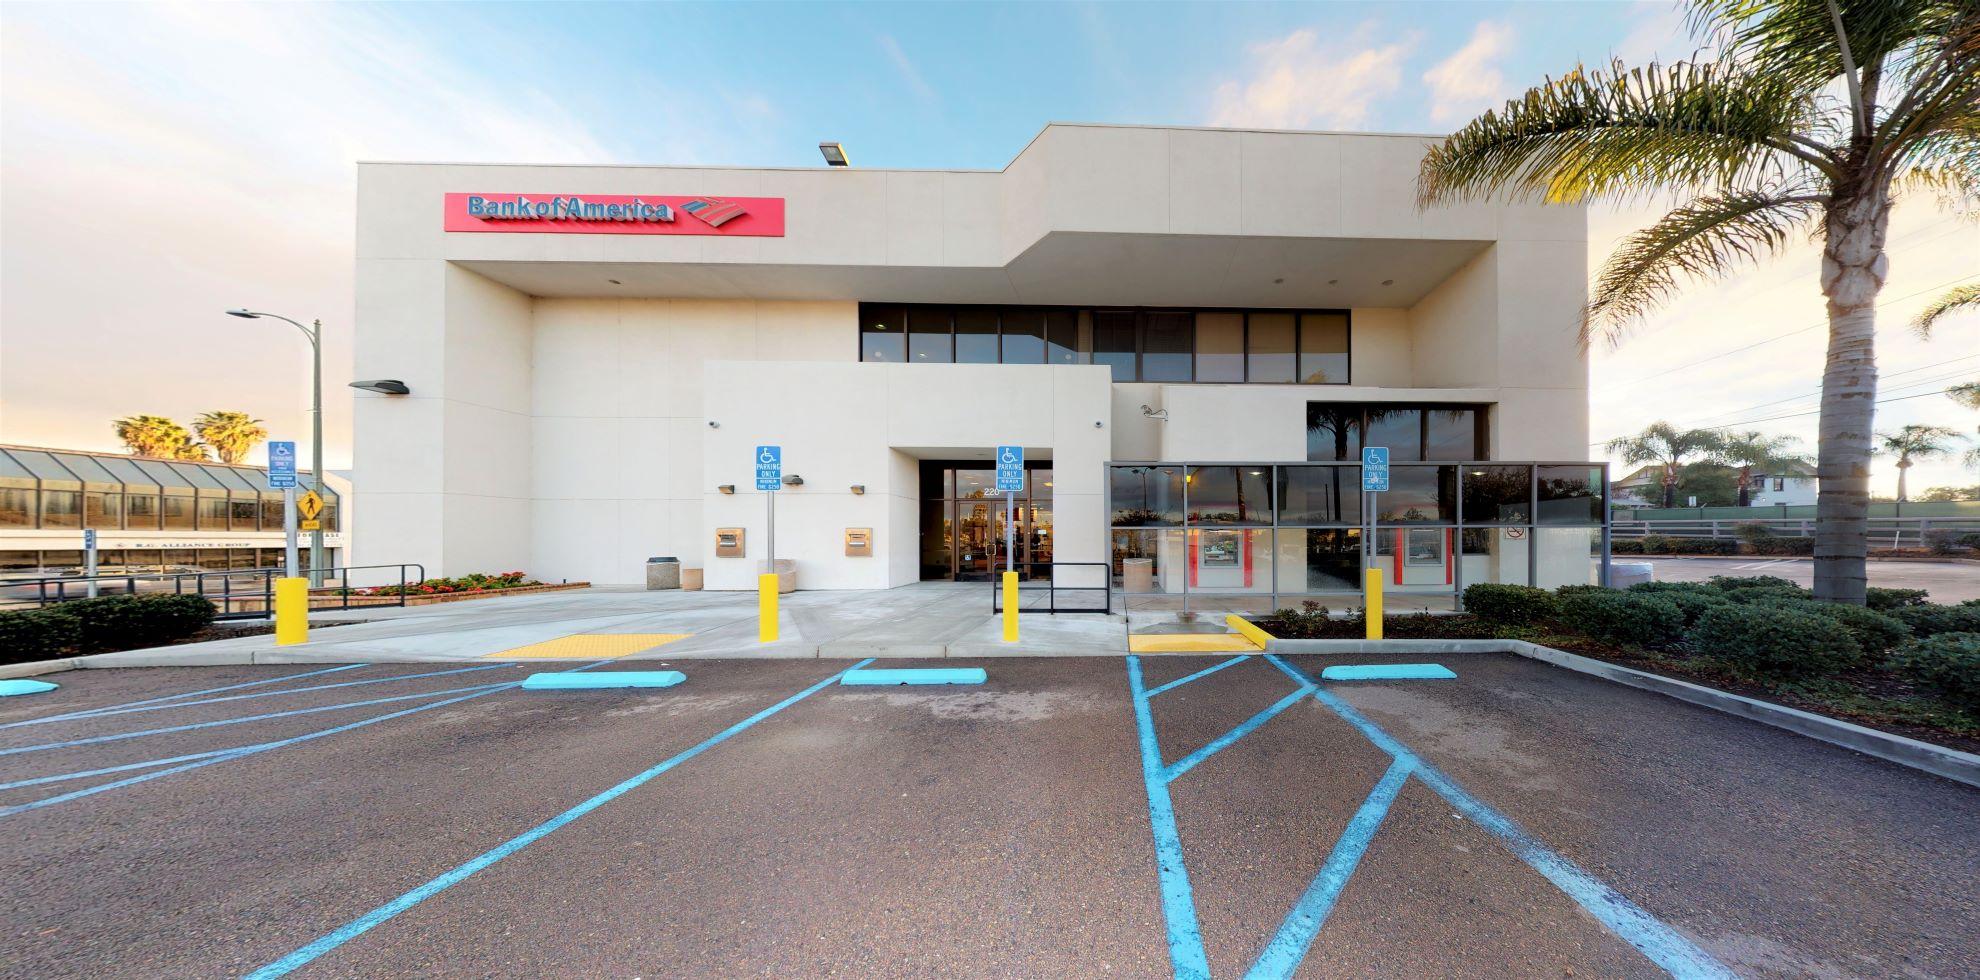 Bank of America financial center with walk-up ATM | 220 S Escondido Blvd, Escondido, CA 92025